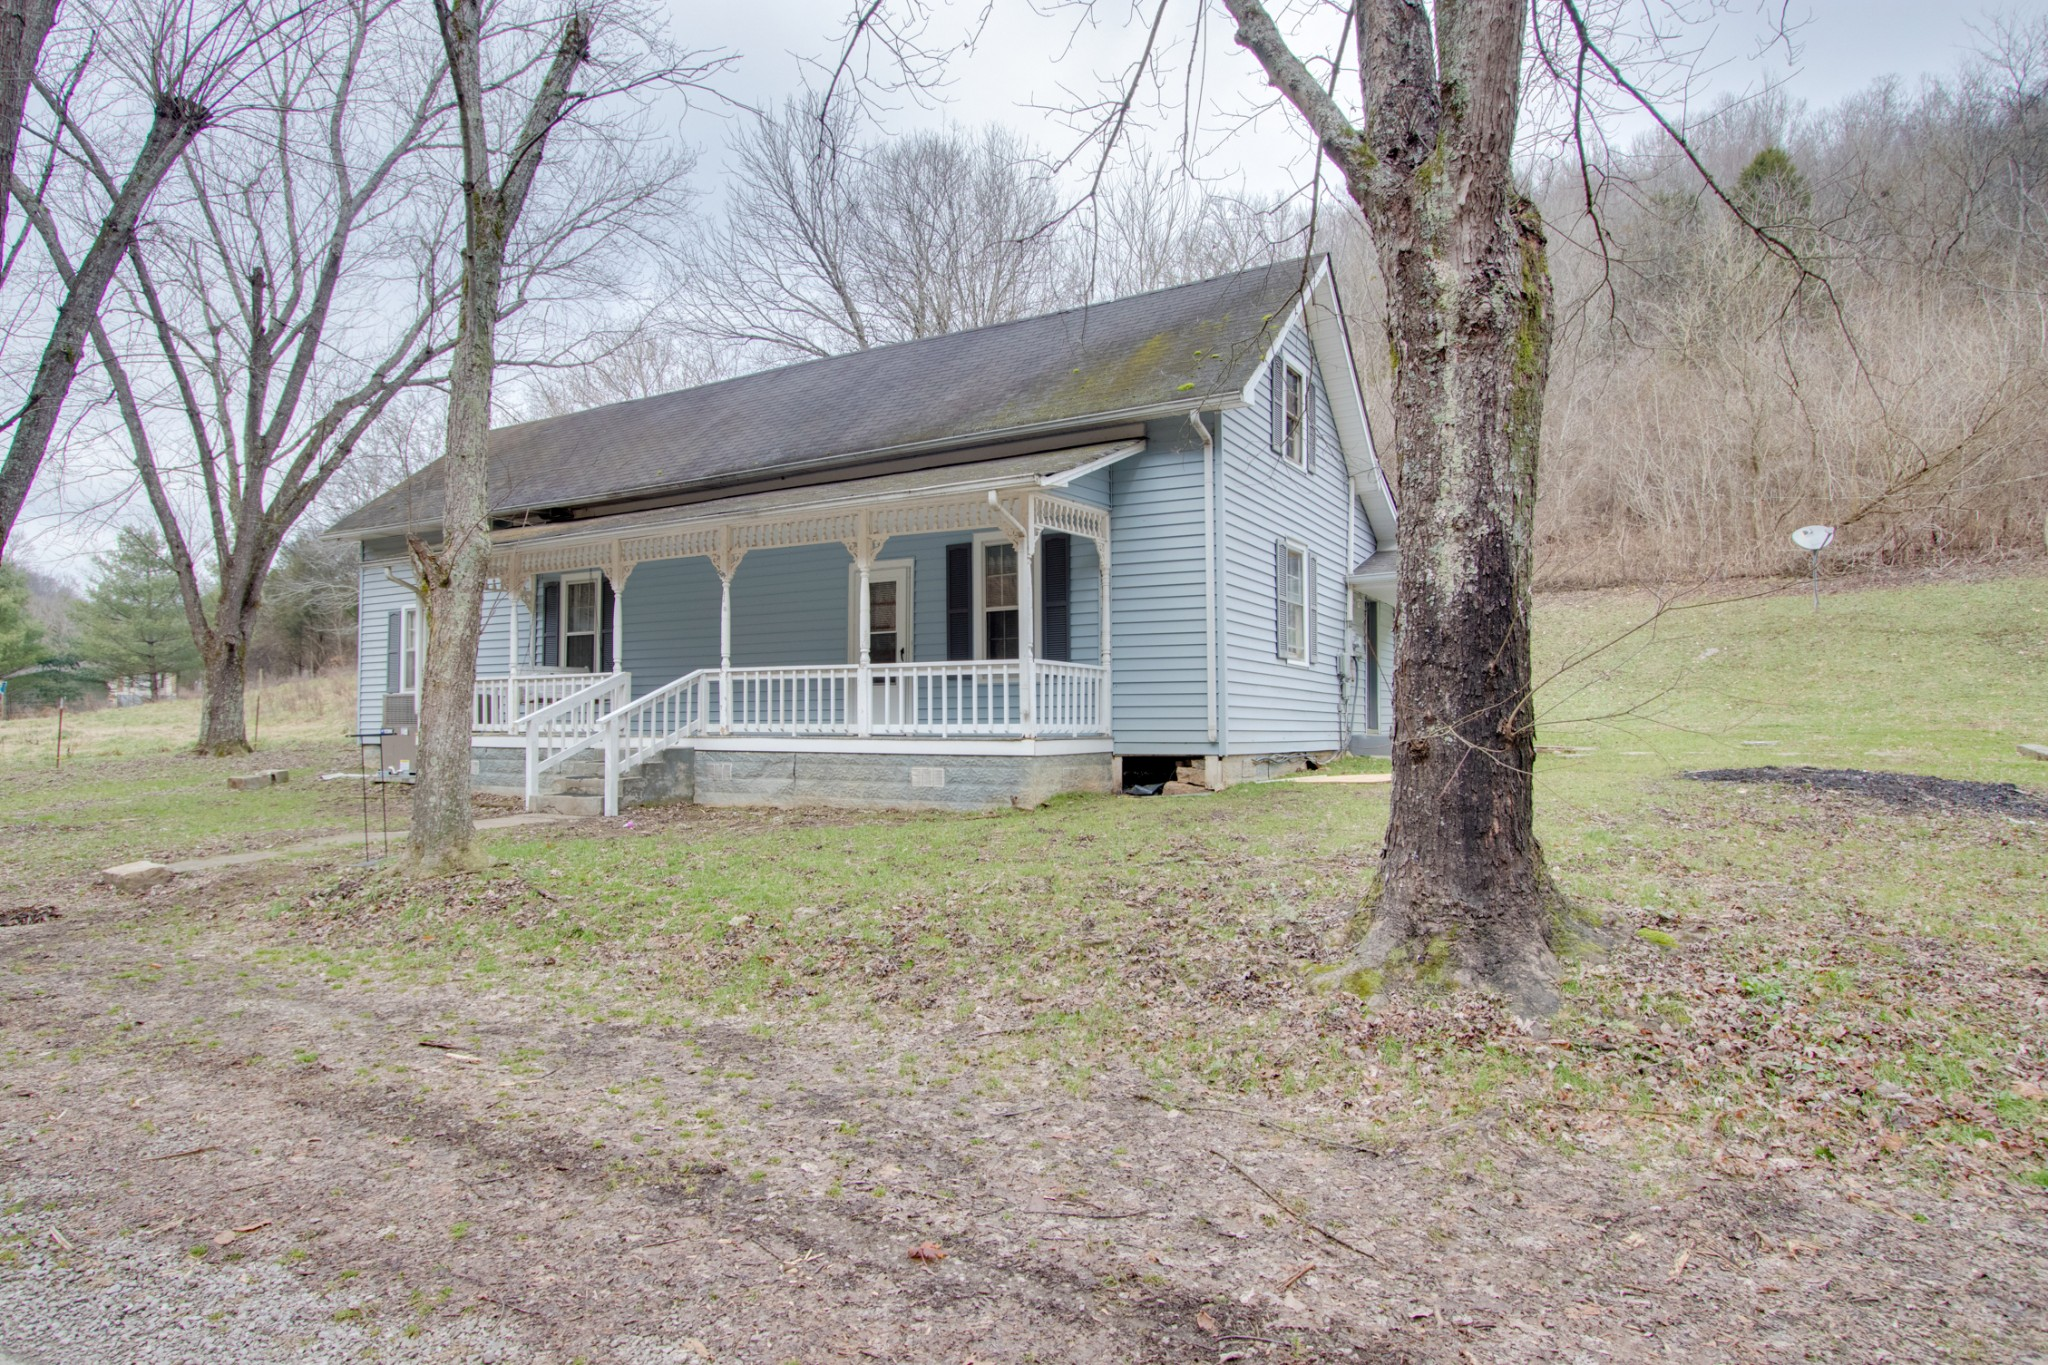 86 Dog Branch Rd, S, Pleasant Shade, TN 37145 - Pleasant Shade, TN real estate listing